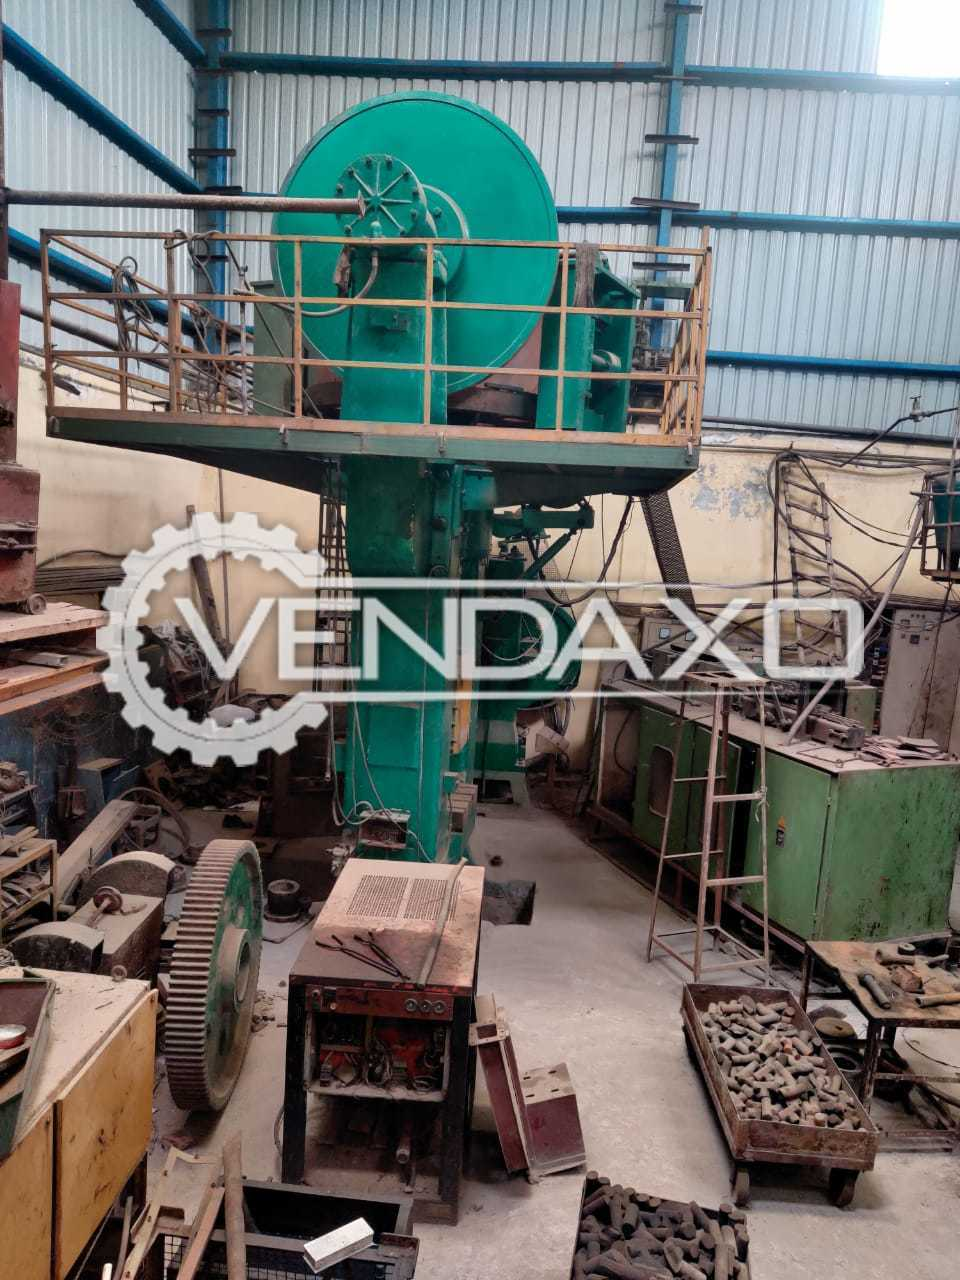 For Sale Used Qingdao honda Power Press - 630 Ton